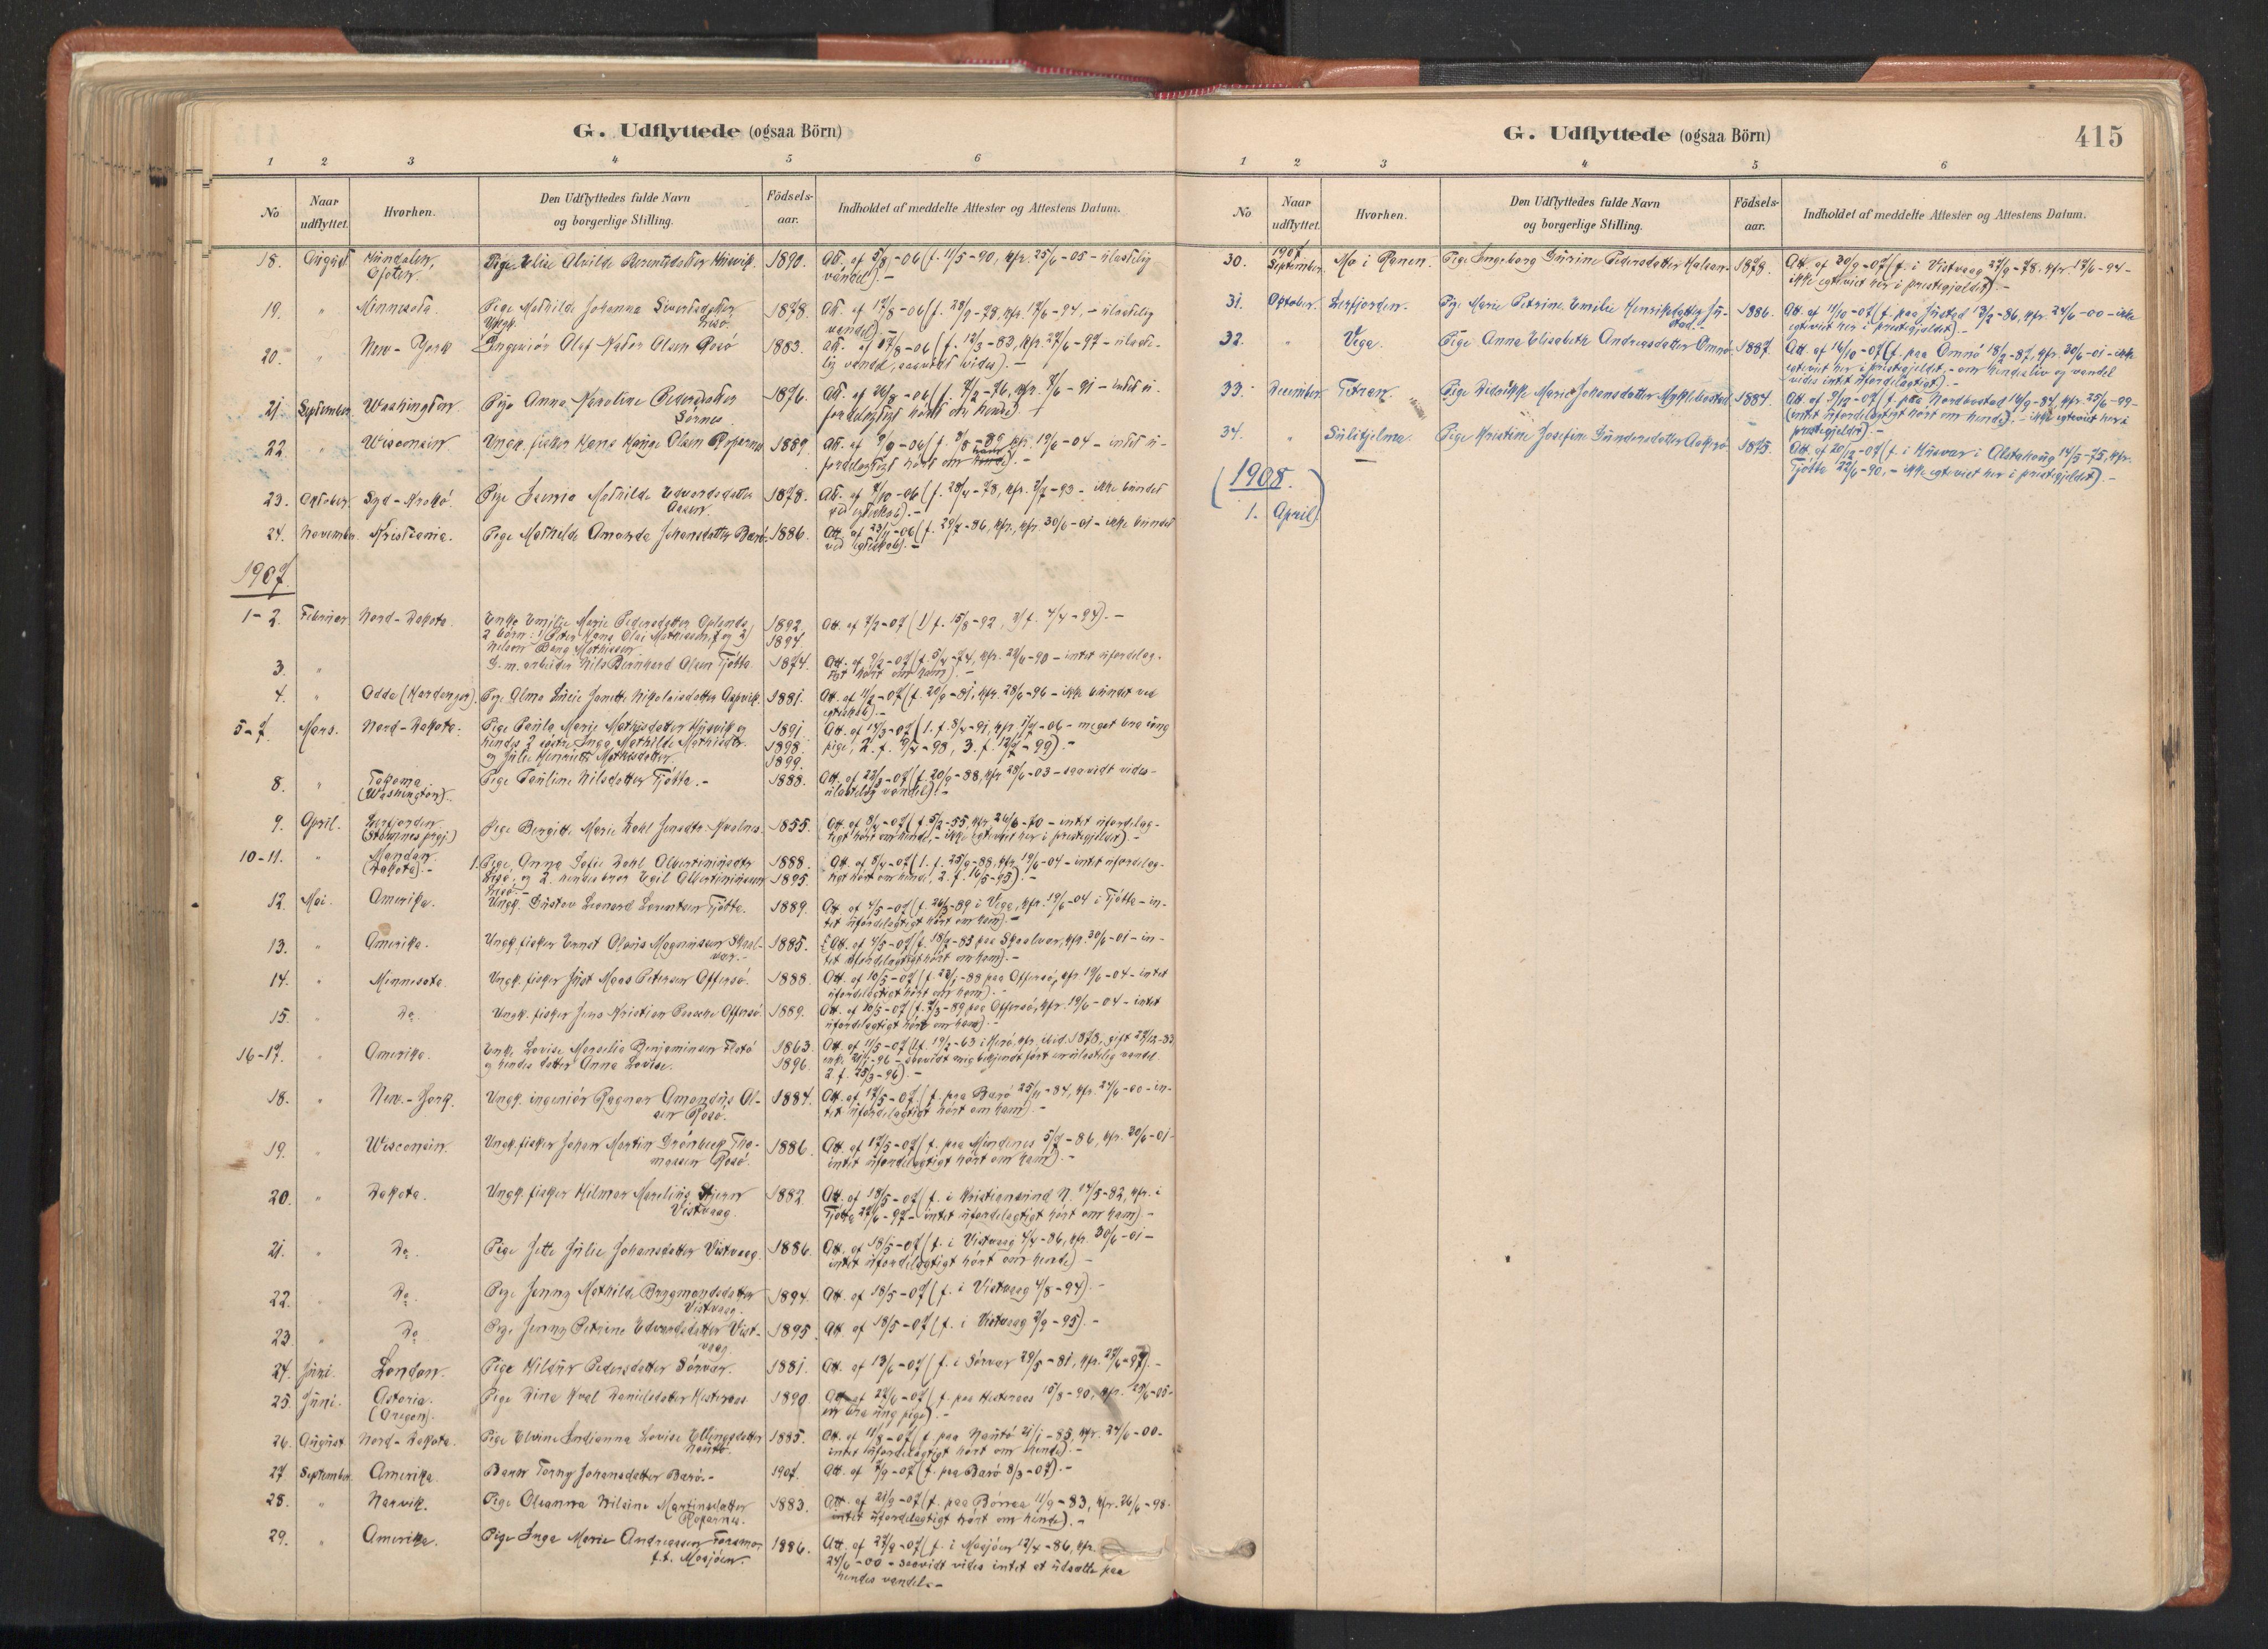 SAT, Ministerialprotokoller, klokkerbøker og fødselsregistre - Nordland, 817/L0264: Ministerialbok nr. 817A04, 1878-1907, s. 415